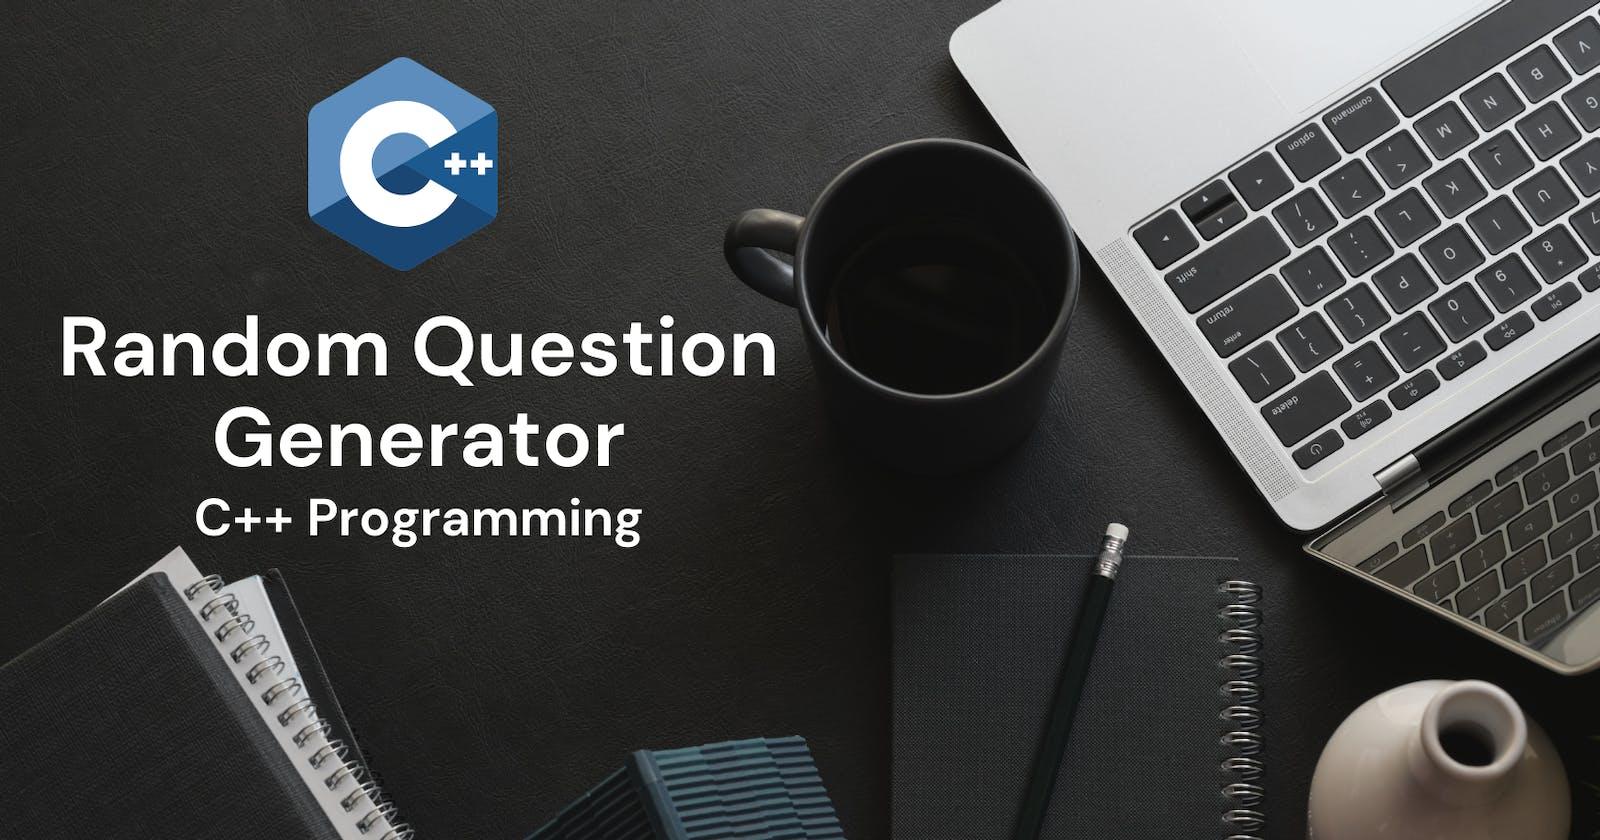 Random Question Generator C++